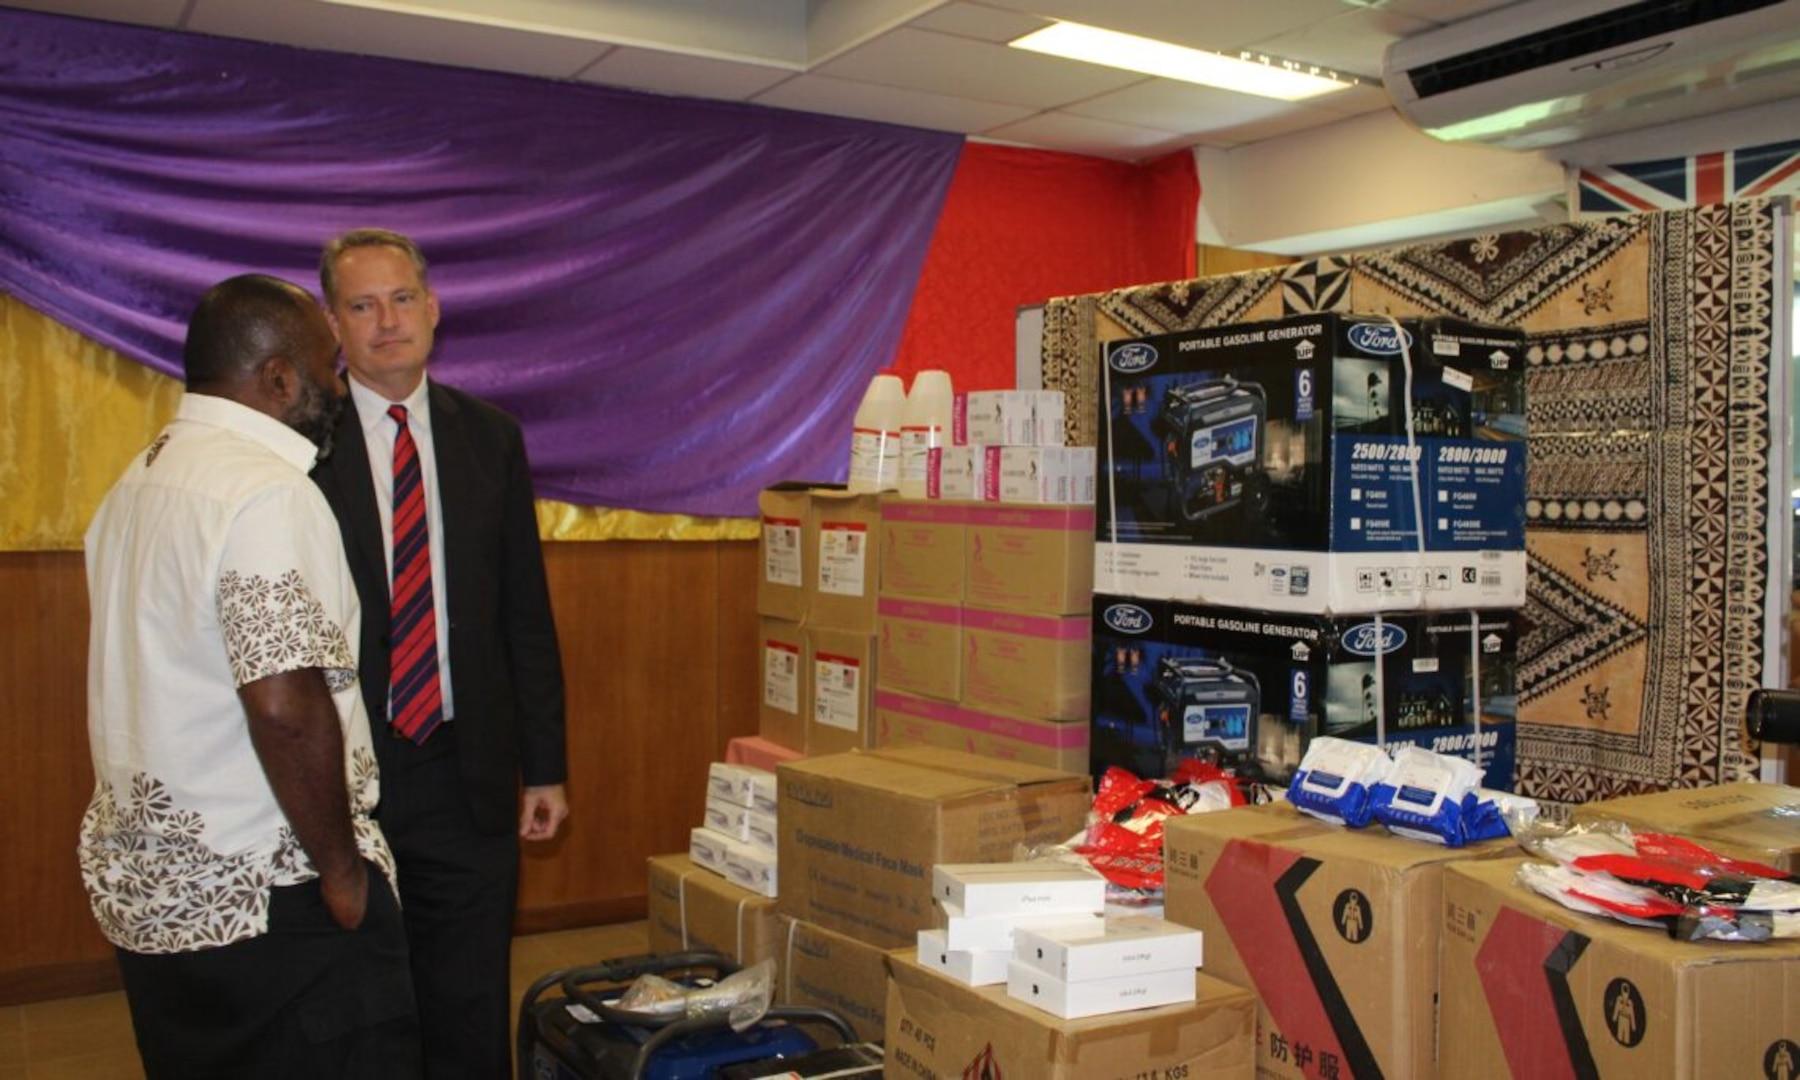 COVID-19 Relief Supplies